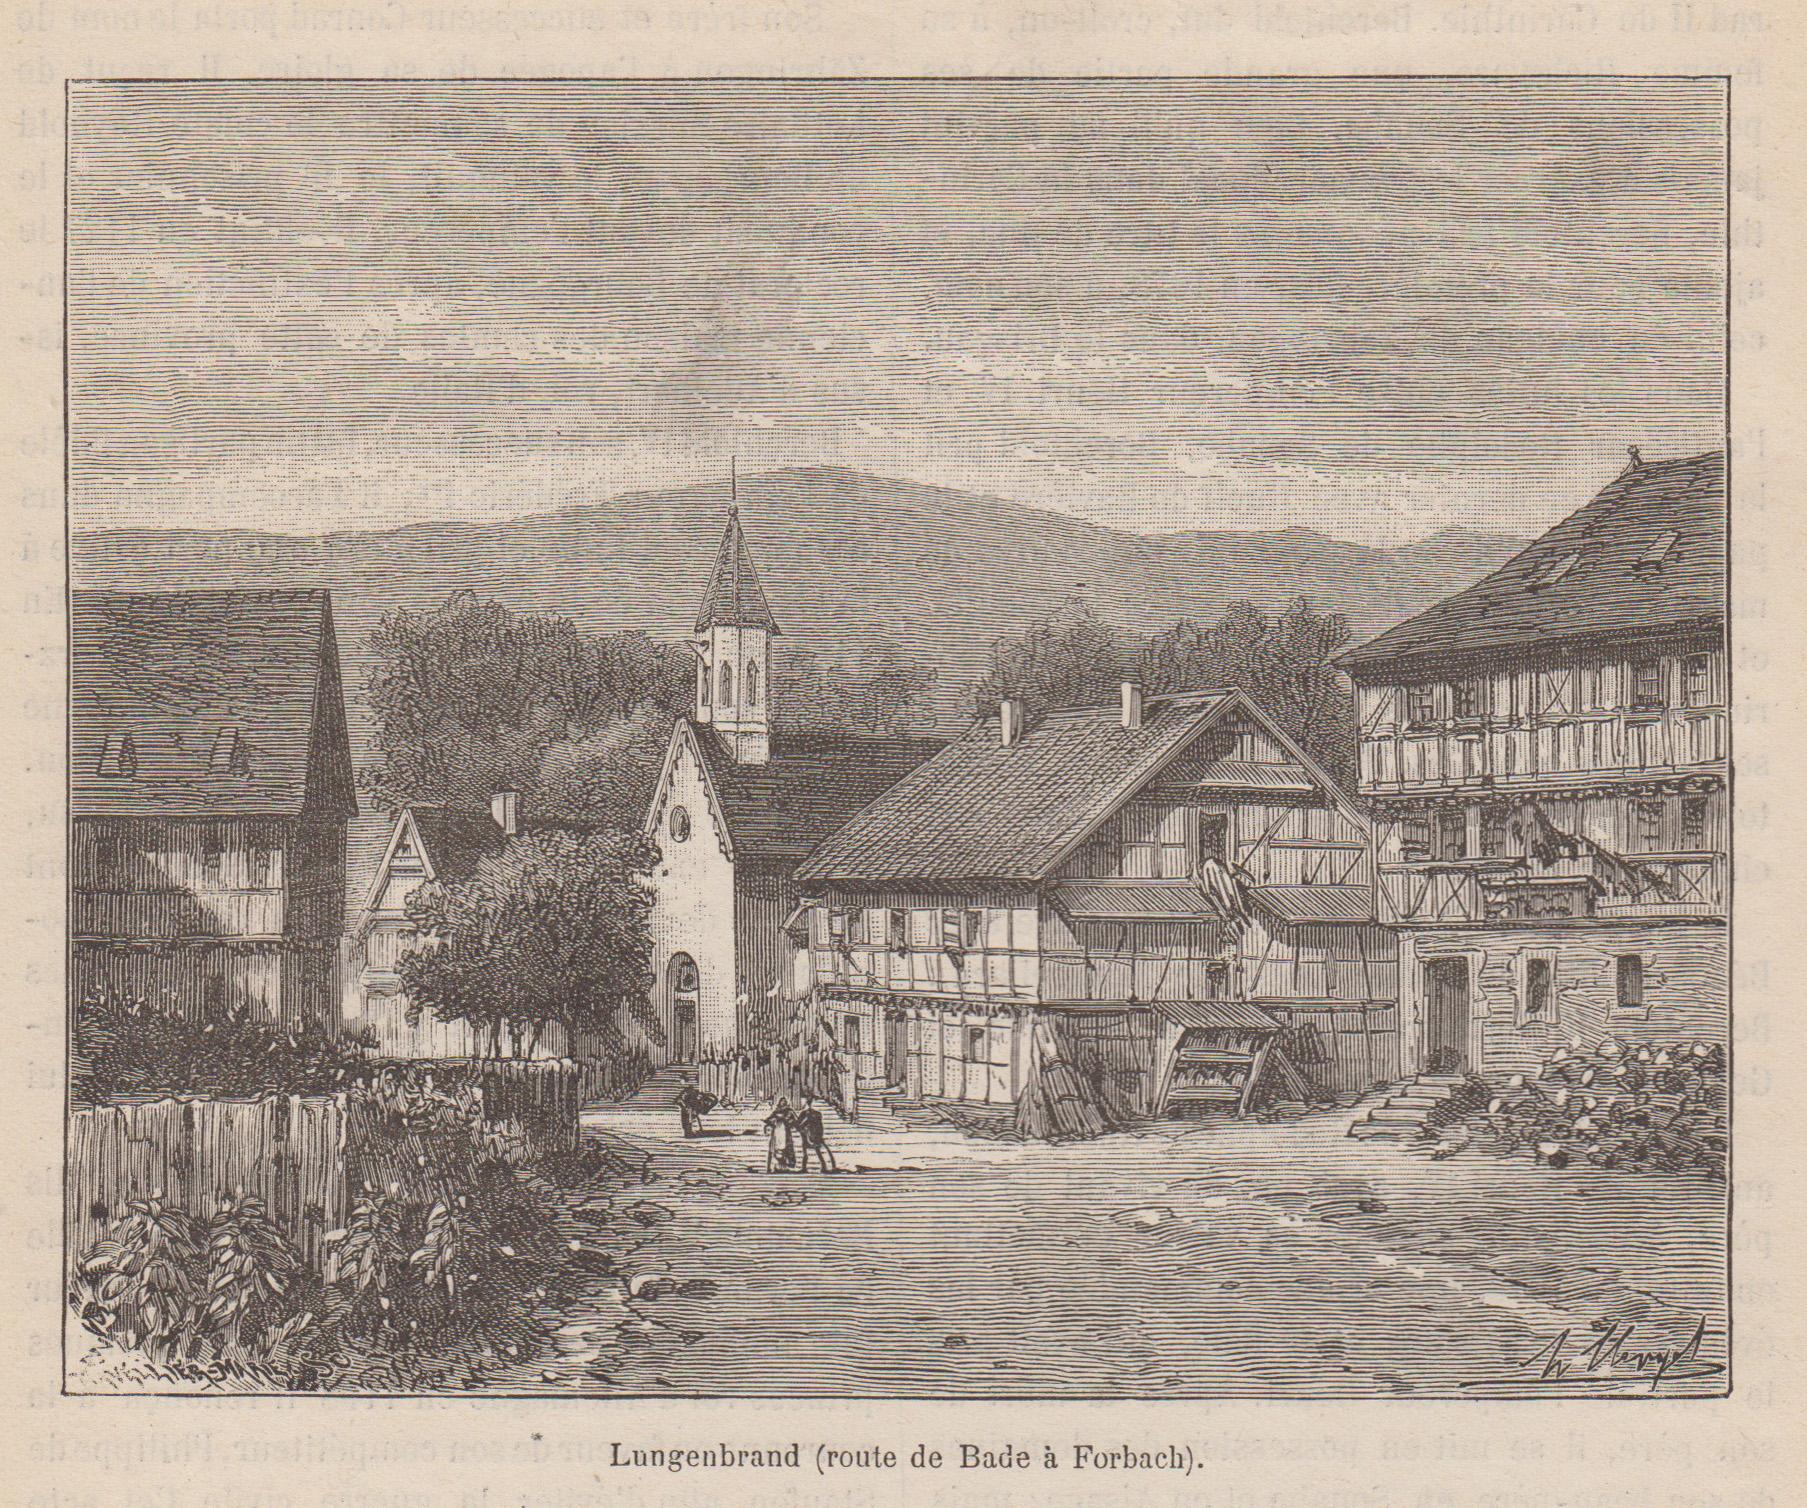 Gesamtans., route de Bade a Forbach.: Forbach/Murgtal: Langenbrand: